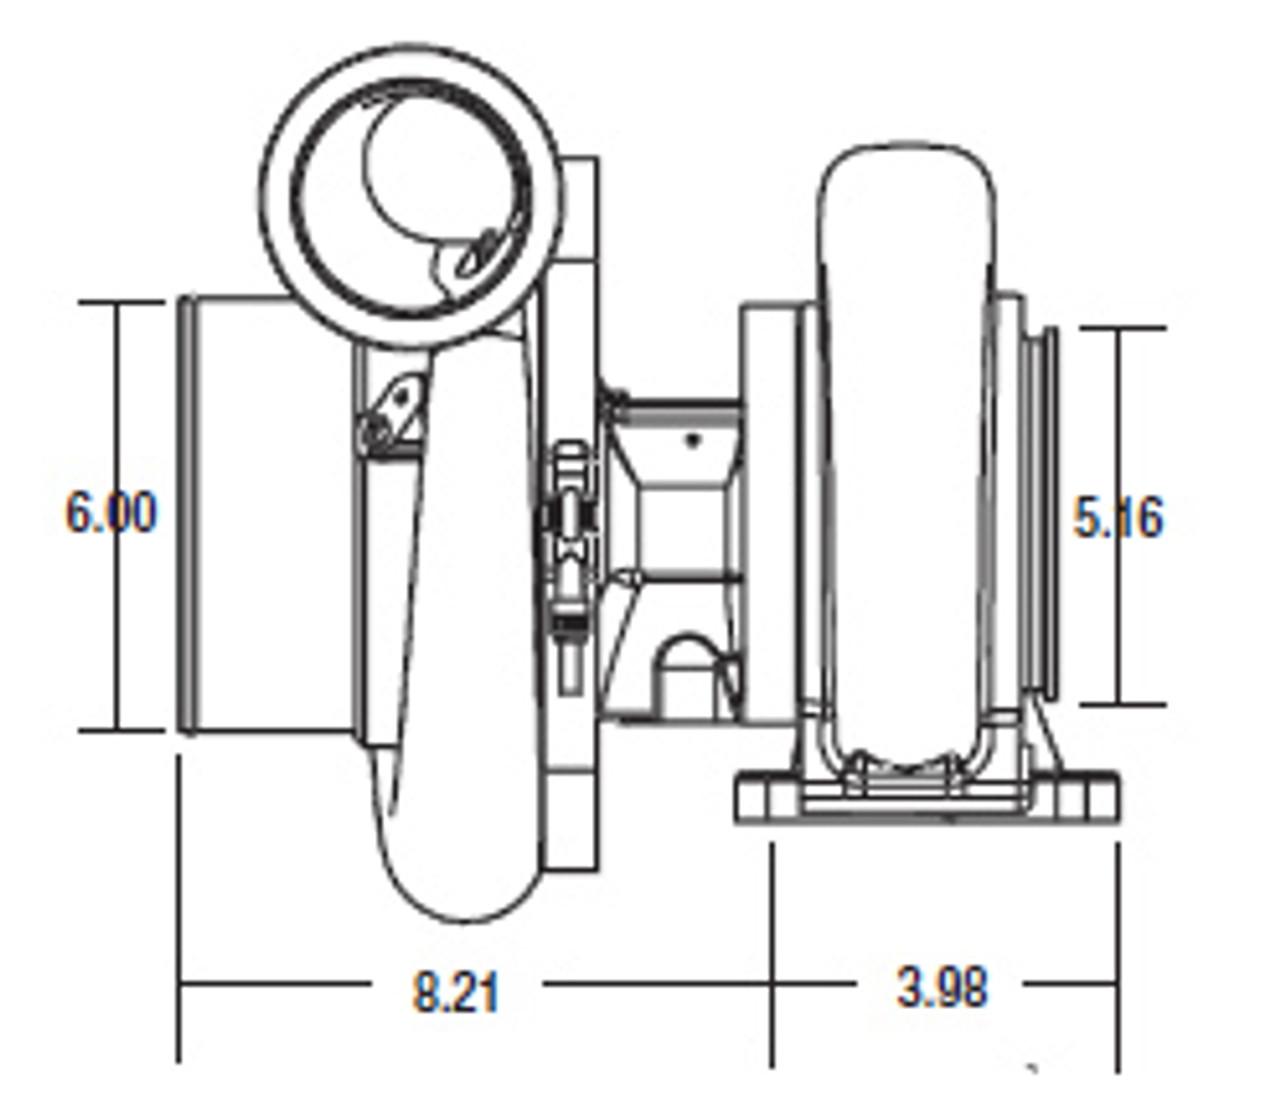 Borg Warner S500sx Turbocharger 88mm: Borg Warner S500SX Turbocharger (91mm)